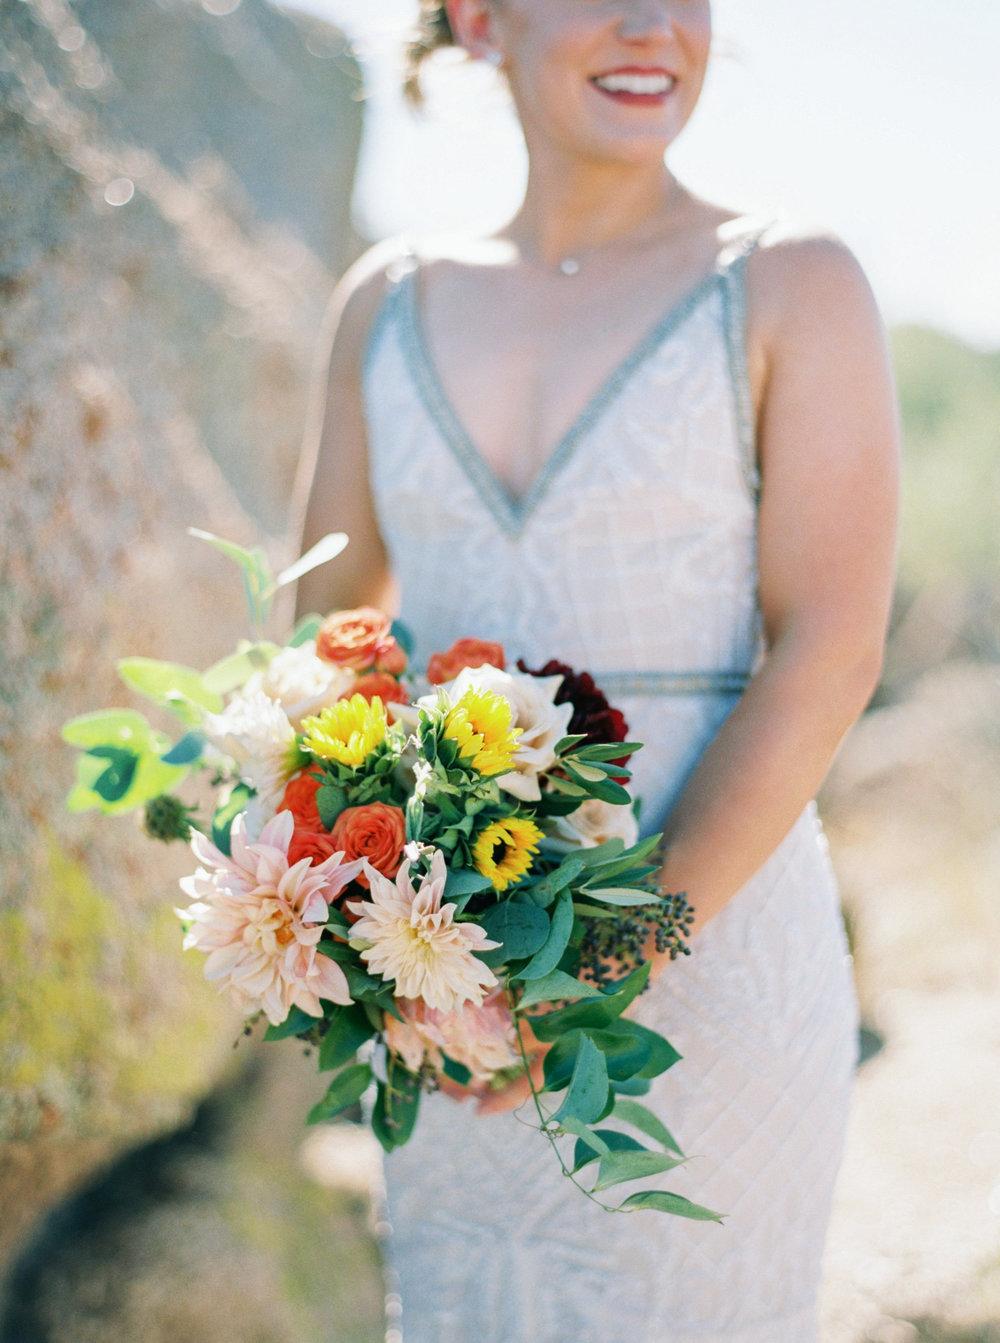 Modern Romances Meets Desert Vibes- with Tremaine Ranch - Arizona Wedding & Event, Vintage, Furniture, Tableware, & Specialty Rentals in Phoenix, Tucson, Flagstaff, Sedona, Tempe, Chandler, Mesa, Gilbert, Prescott, Payson24.jpg